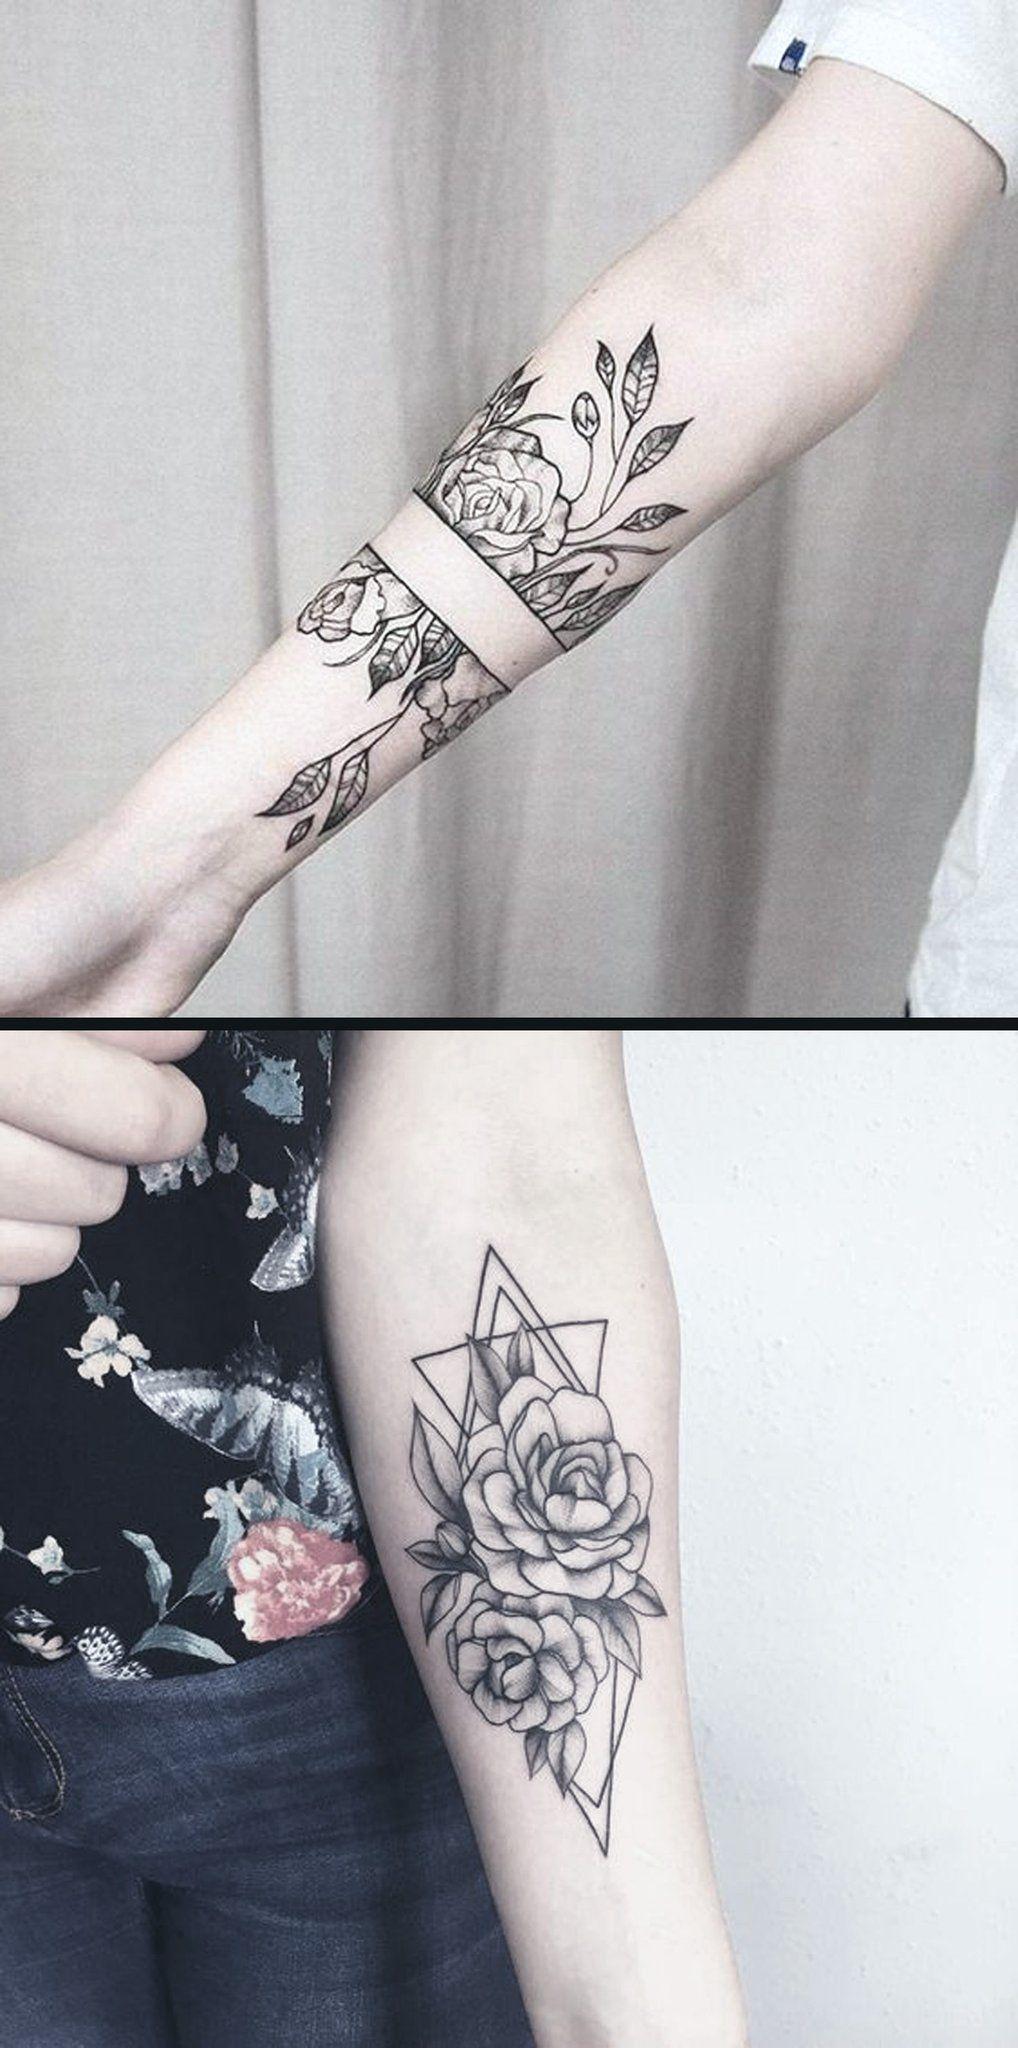 Geometric Diamond Rose Forearm Tattoo Ideas For Women Black Wild inside measurements 1018 X 2048